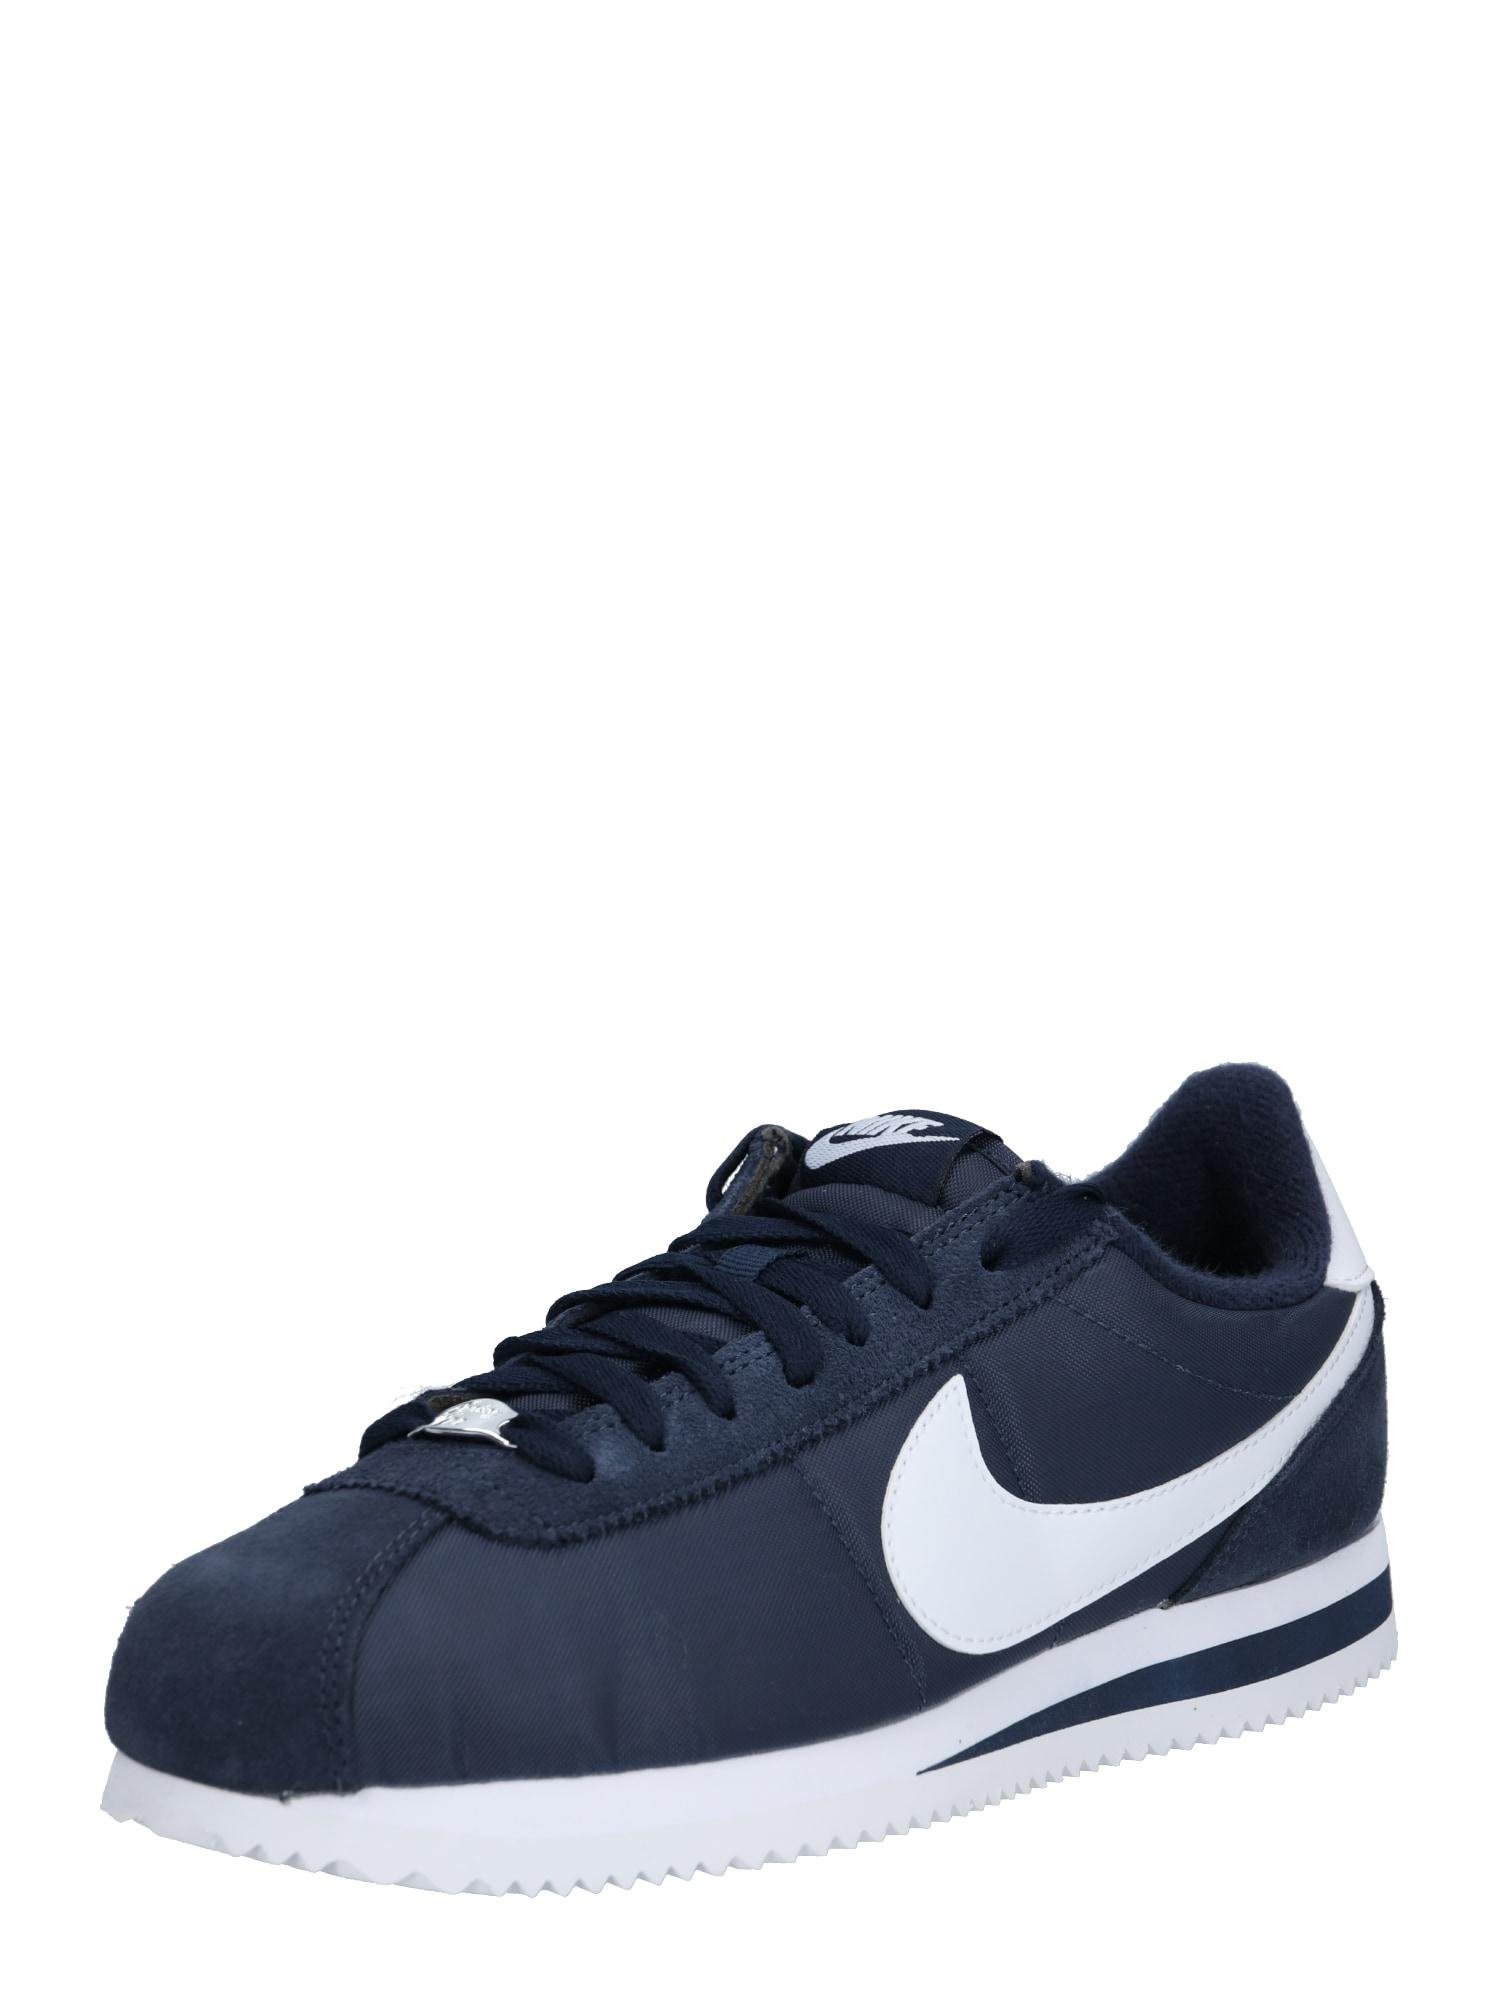 Nike Sportswear Nízke tenisky  biela / námornícka modrá